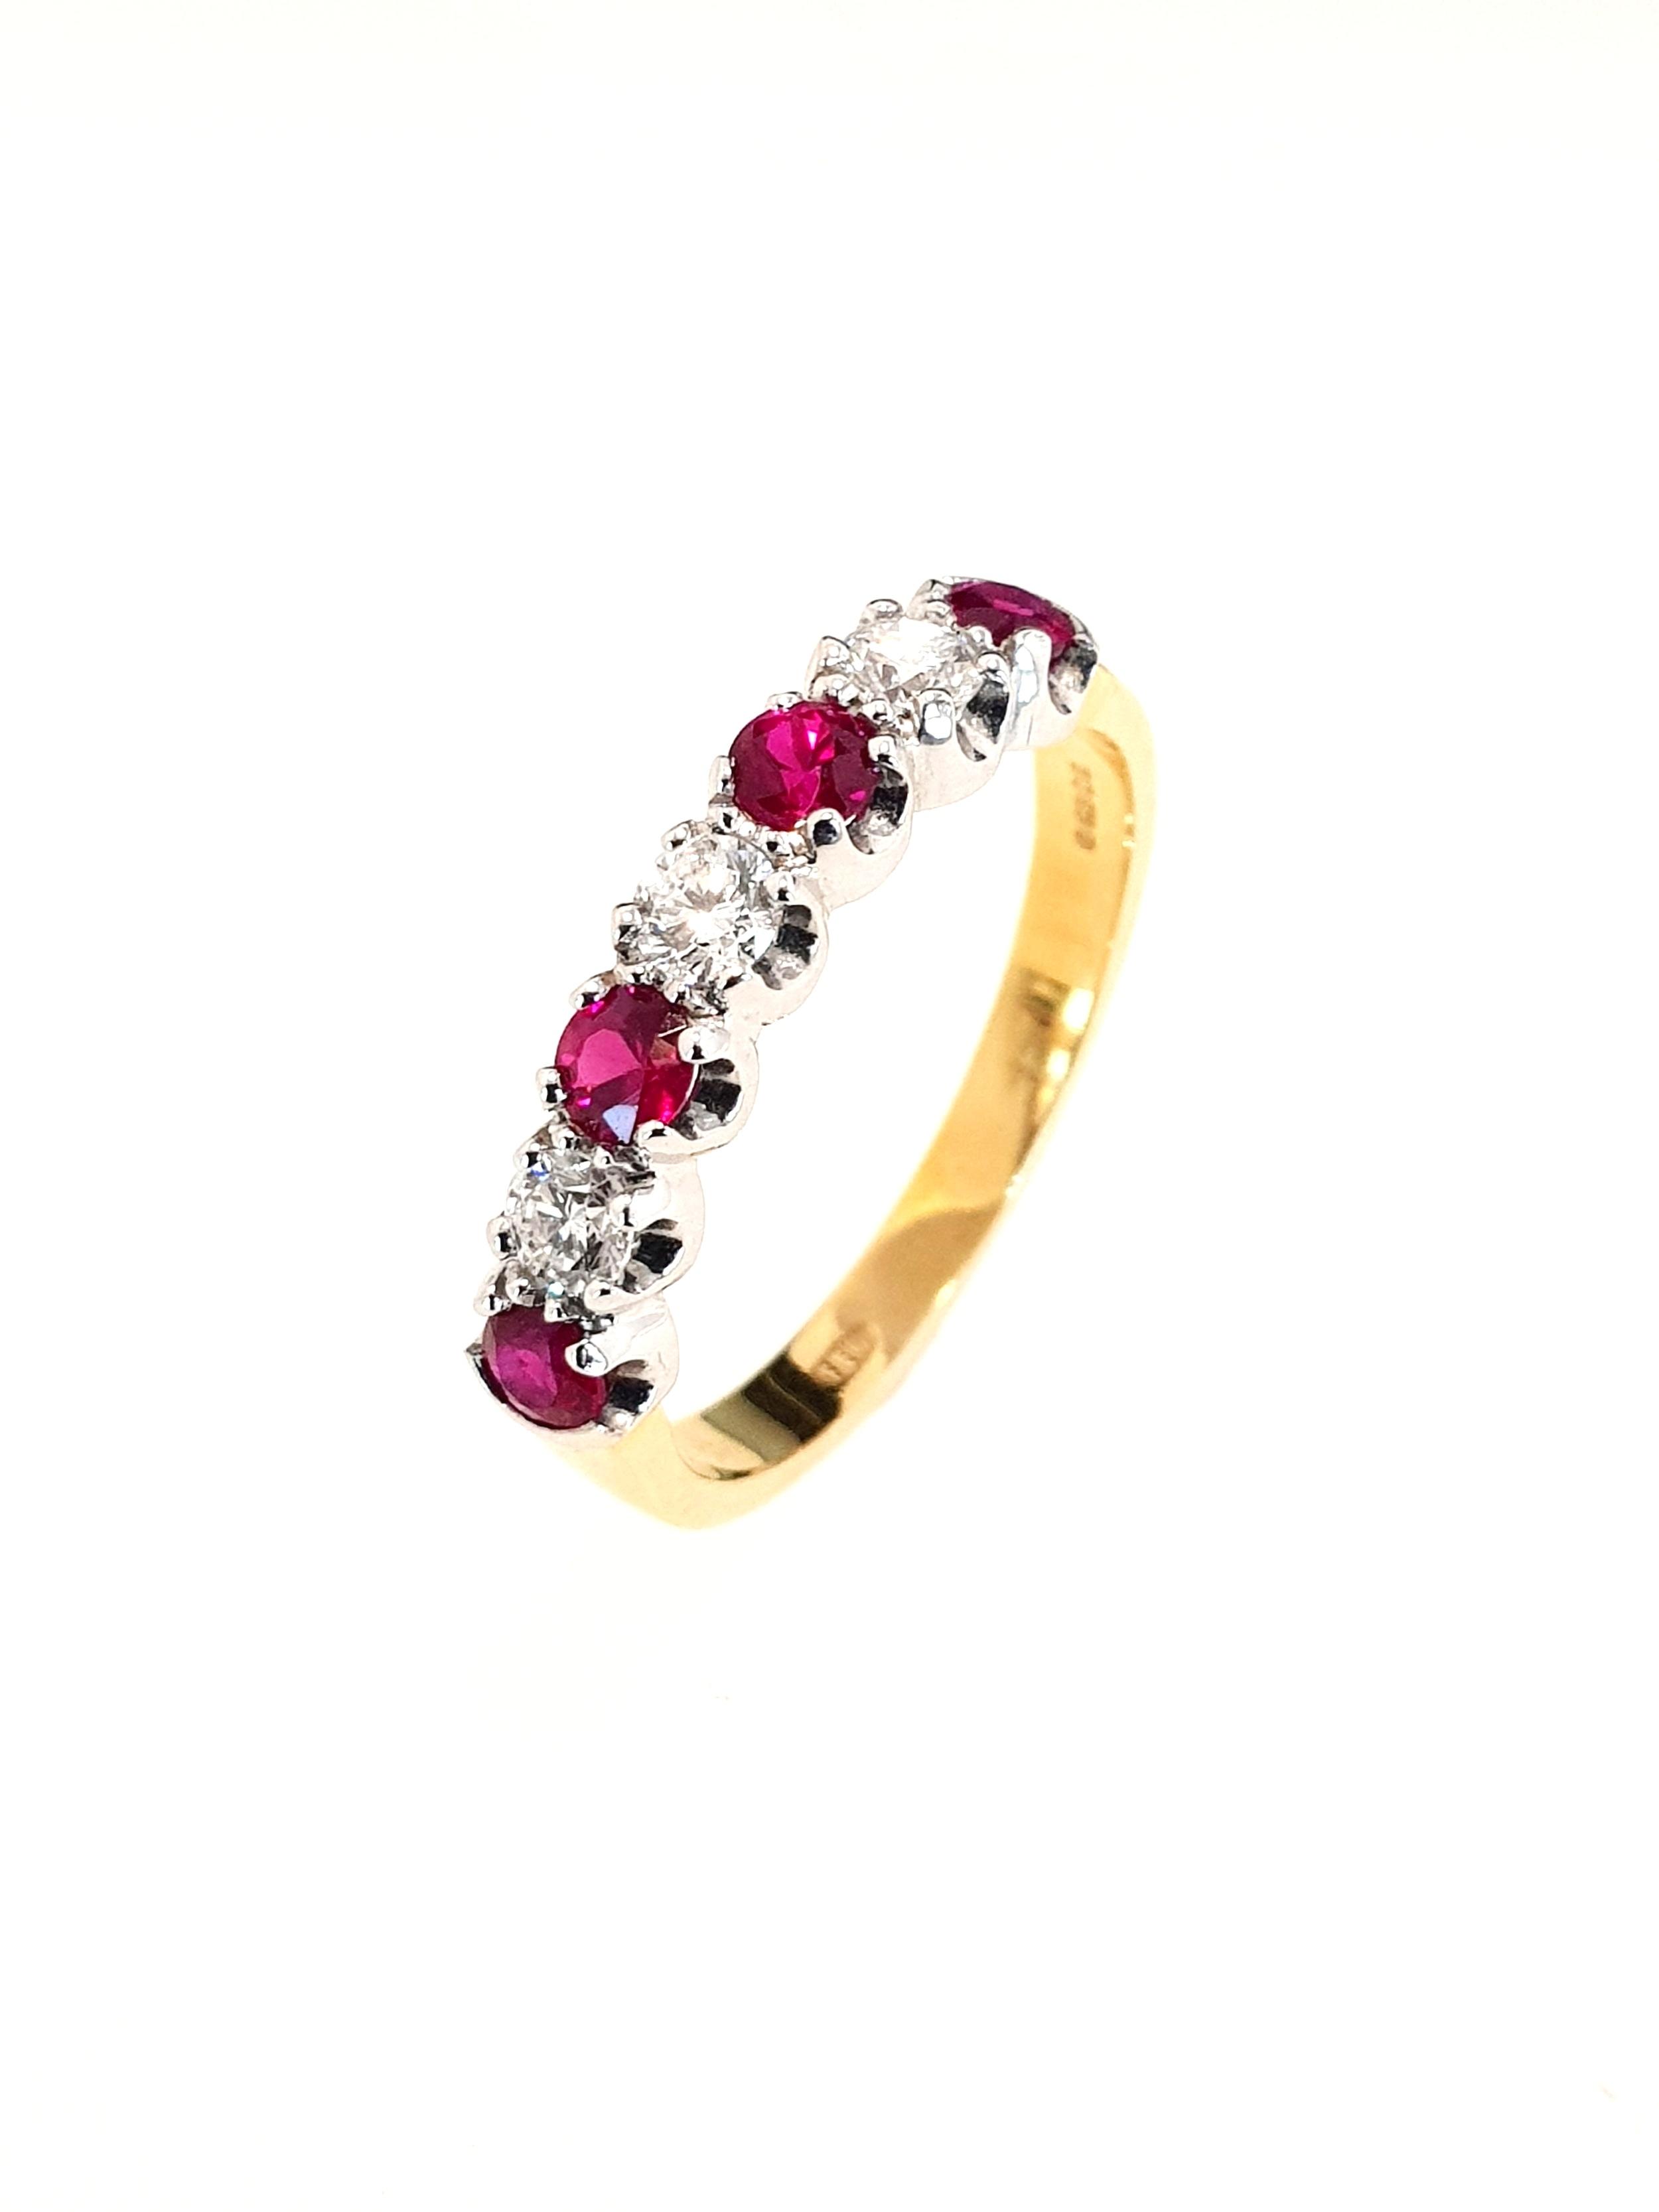 18ct Yellow Gold Ruby (.46ct) & Diamond Ring  Diamond: .26ct, G, Si1  Stock Code: N85136  £1375